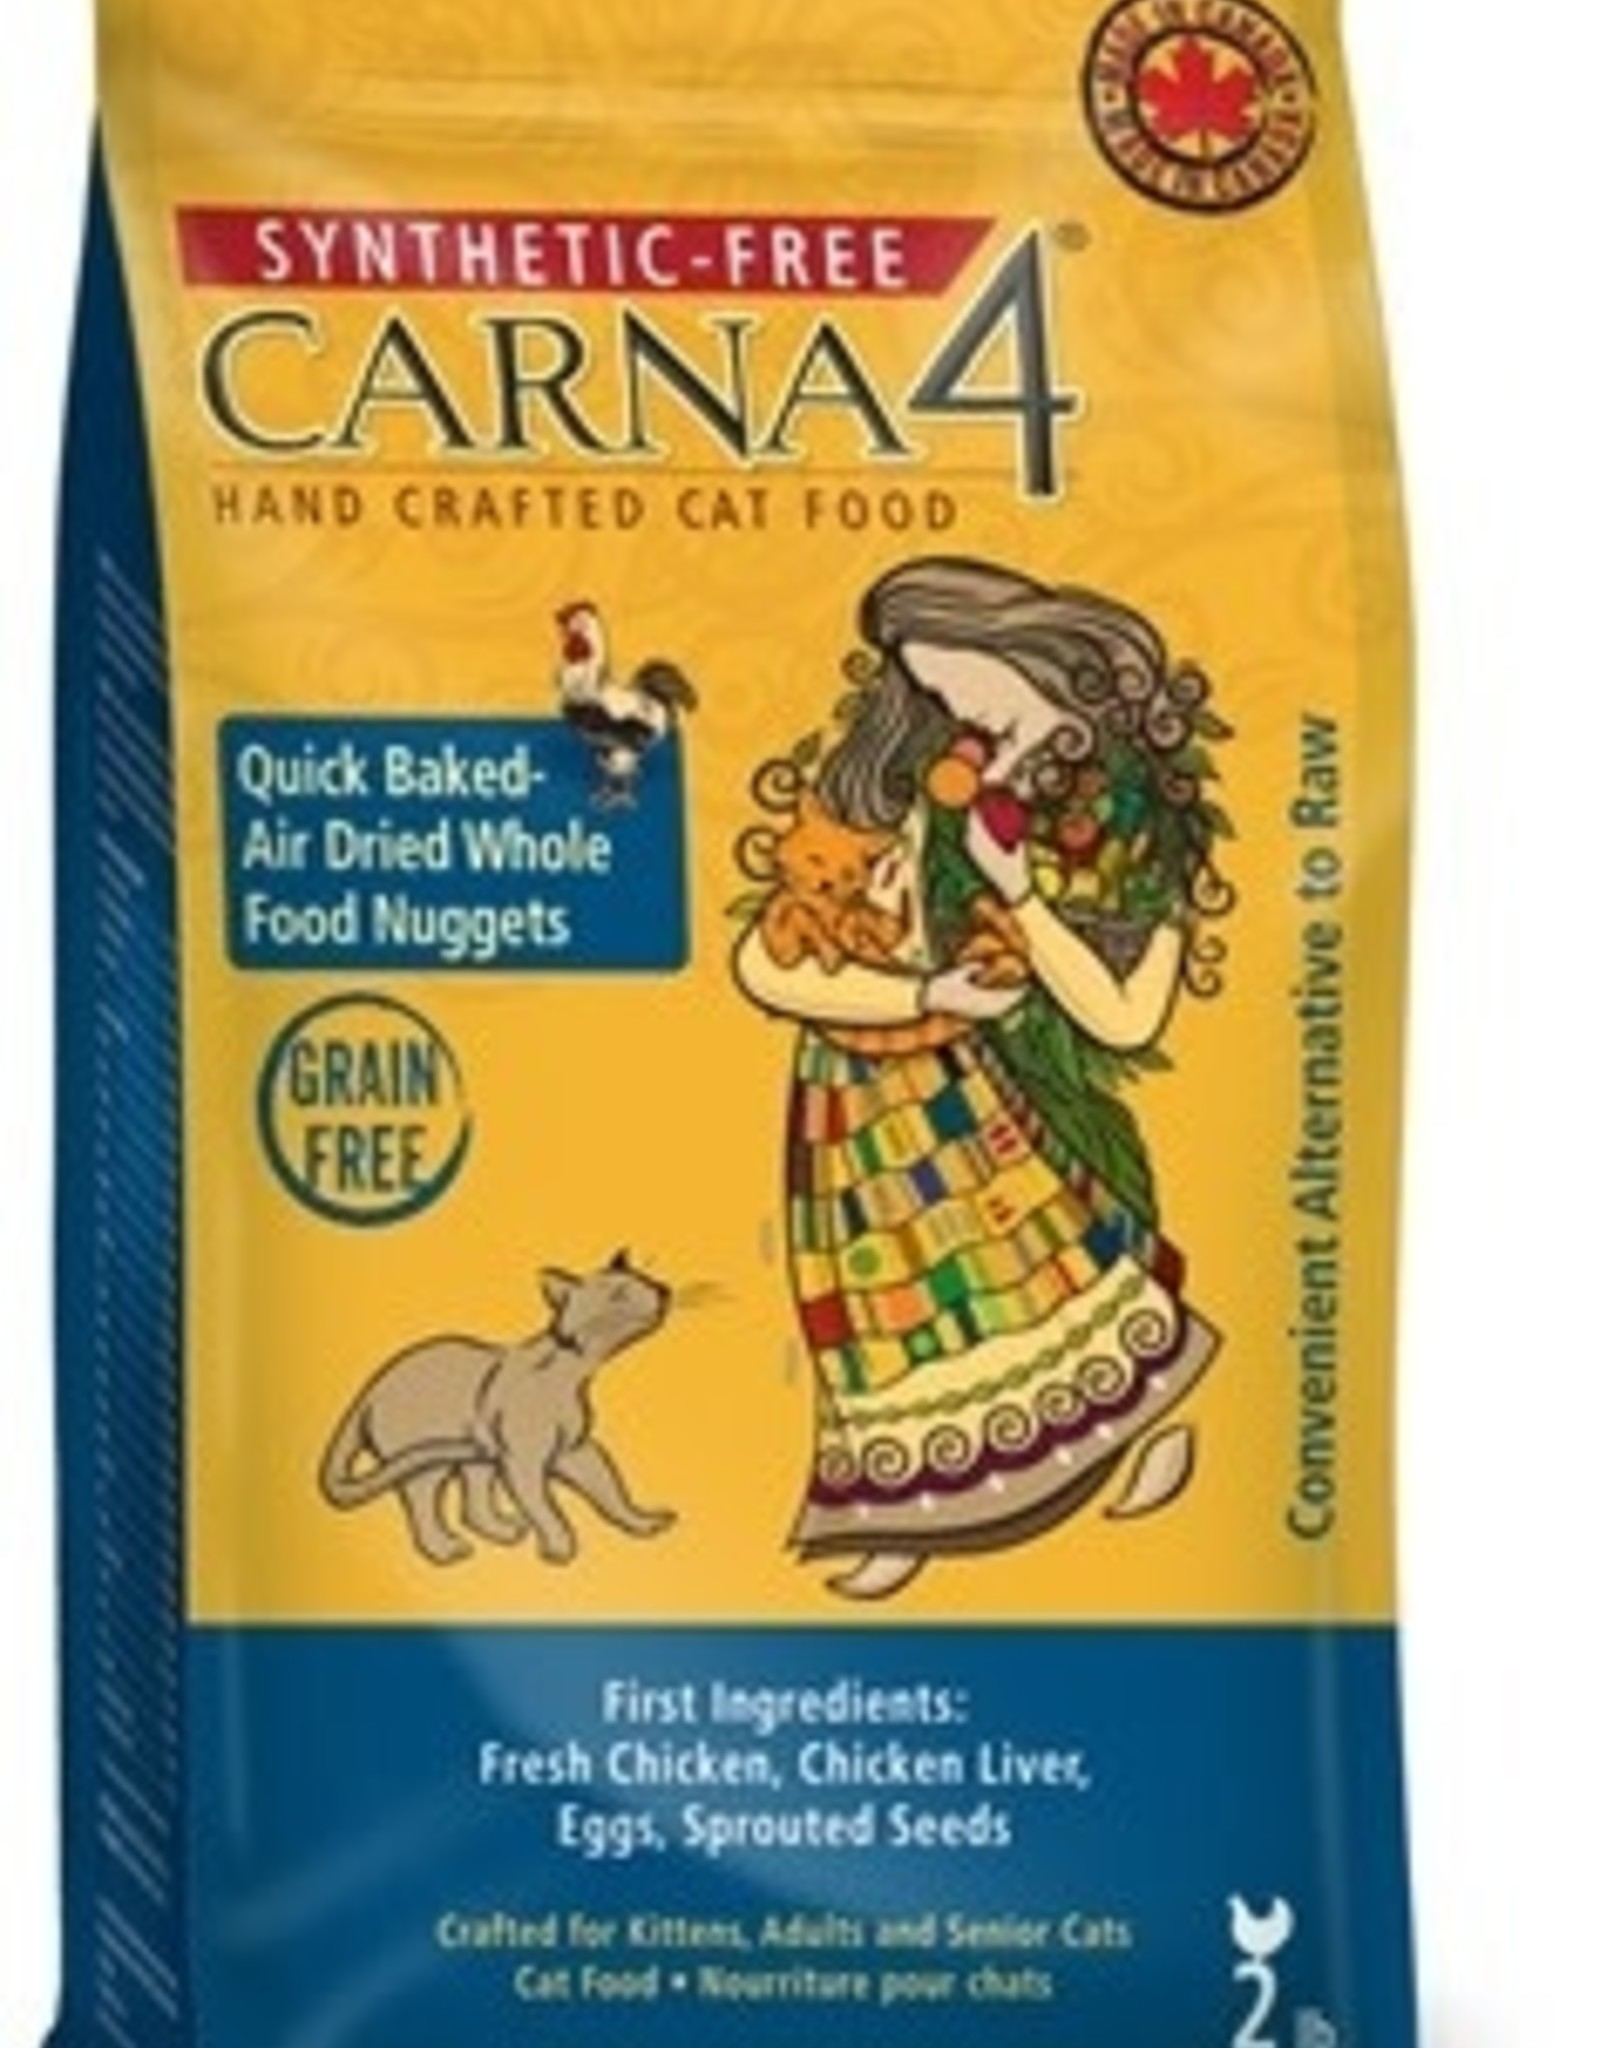 Carna4 Carna4 Cat Dry